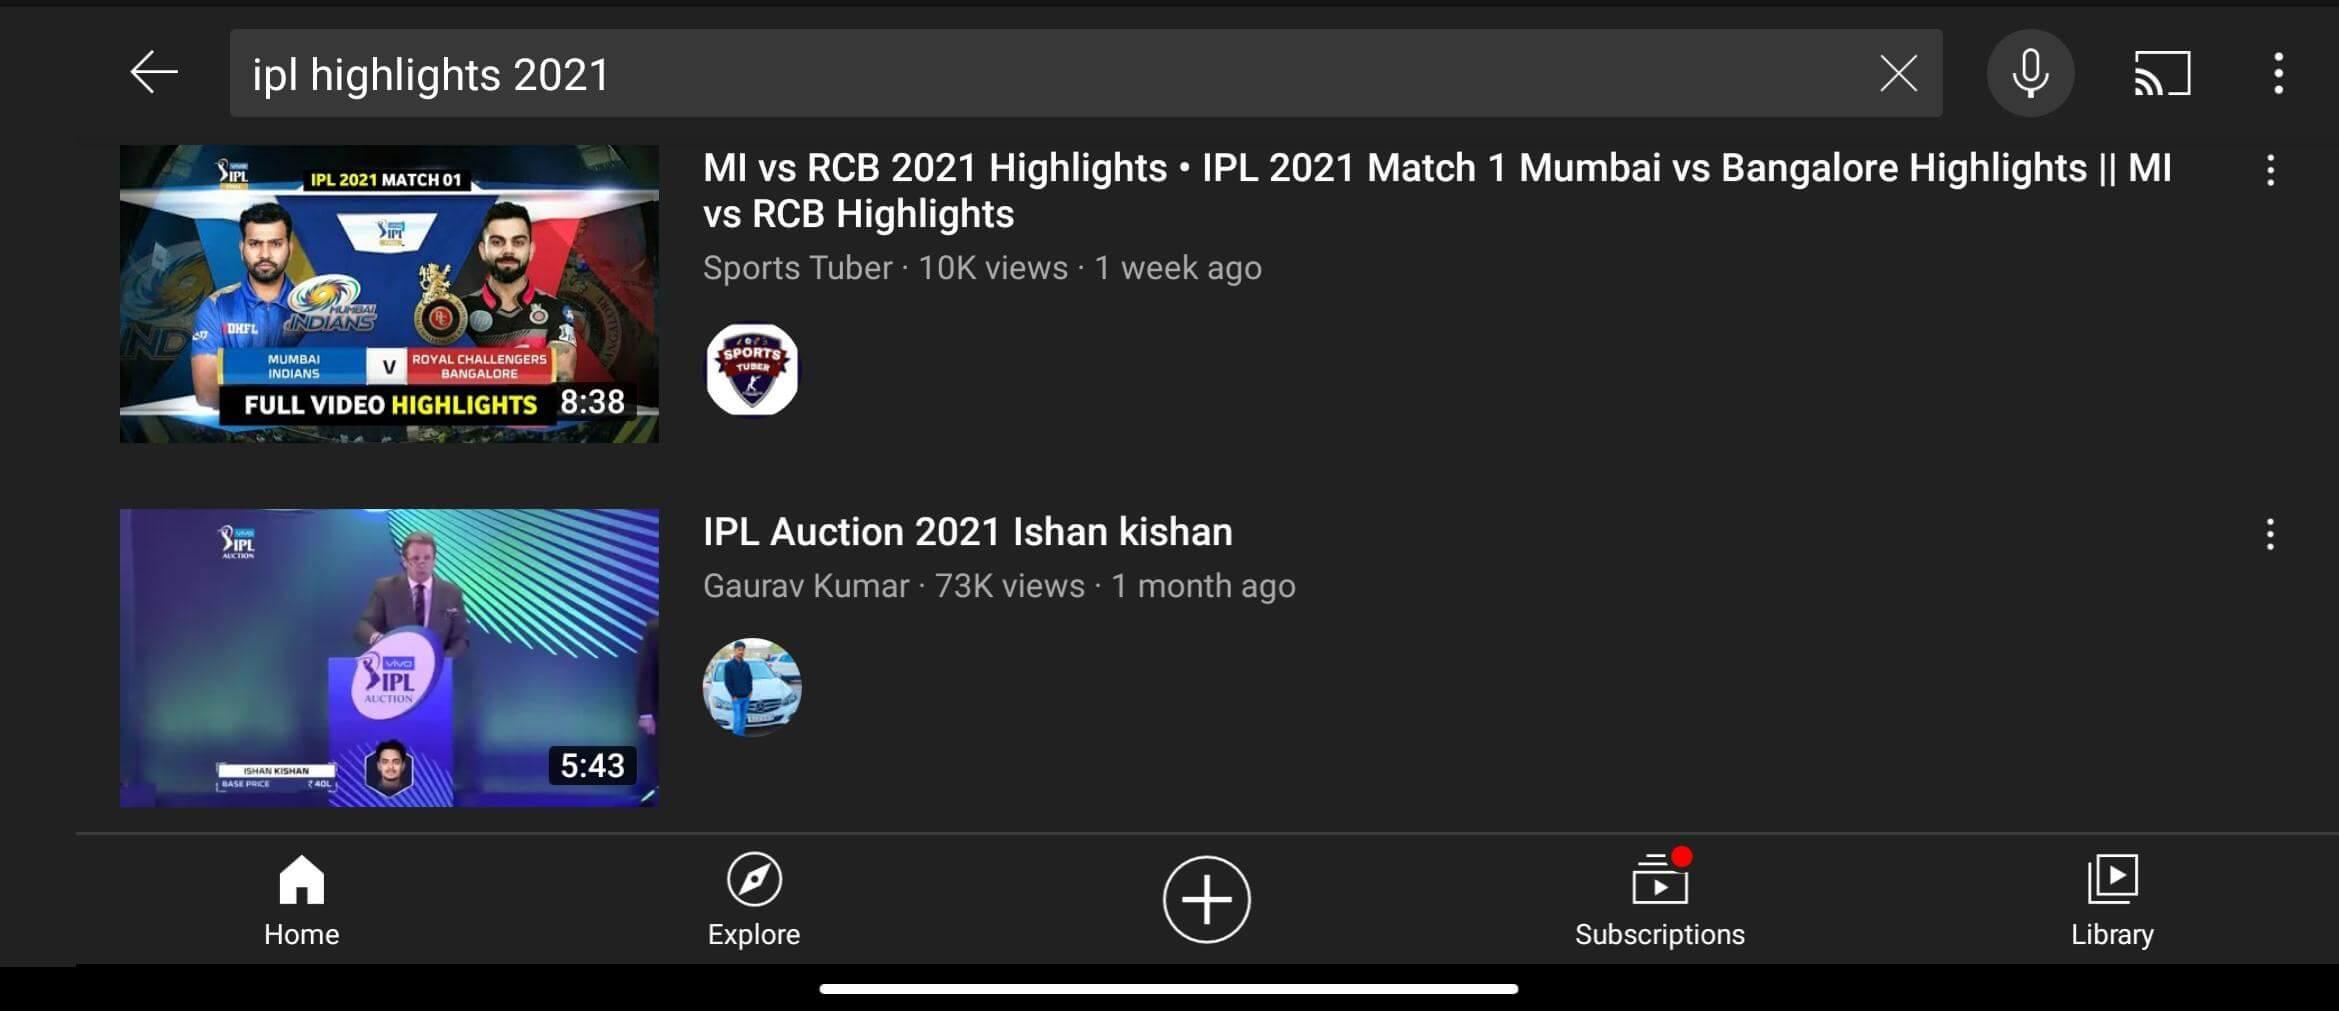 Best VR Headset to watch IPL Live